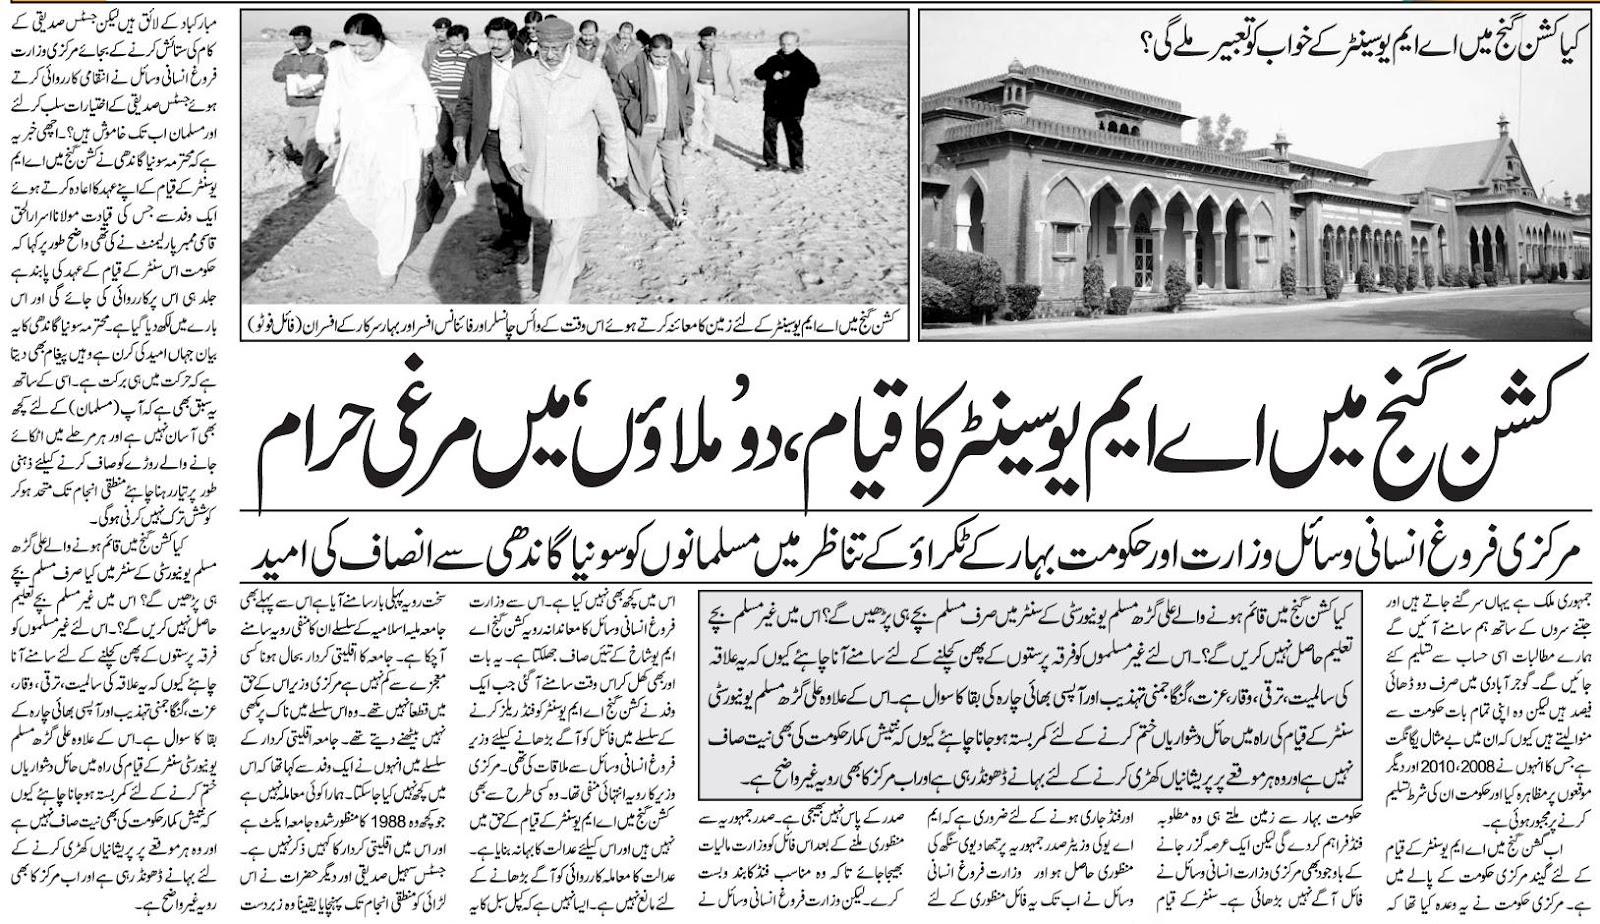 electronic media in urdu language Urdu, media, khabar, akhbar, daily, news, muslims urdu portal, muslim news, minority news, world news in urdu language, urdu in india, ghalib urdu.